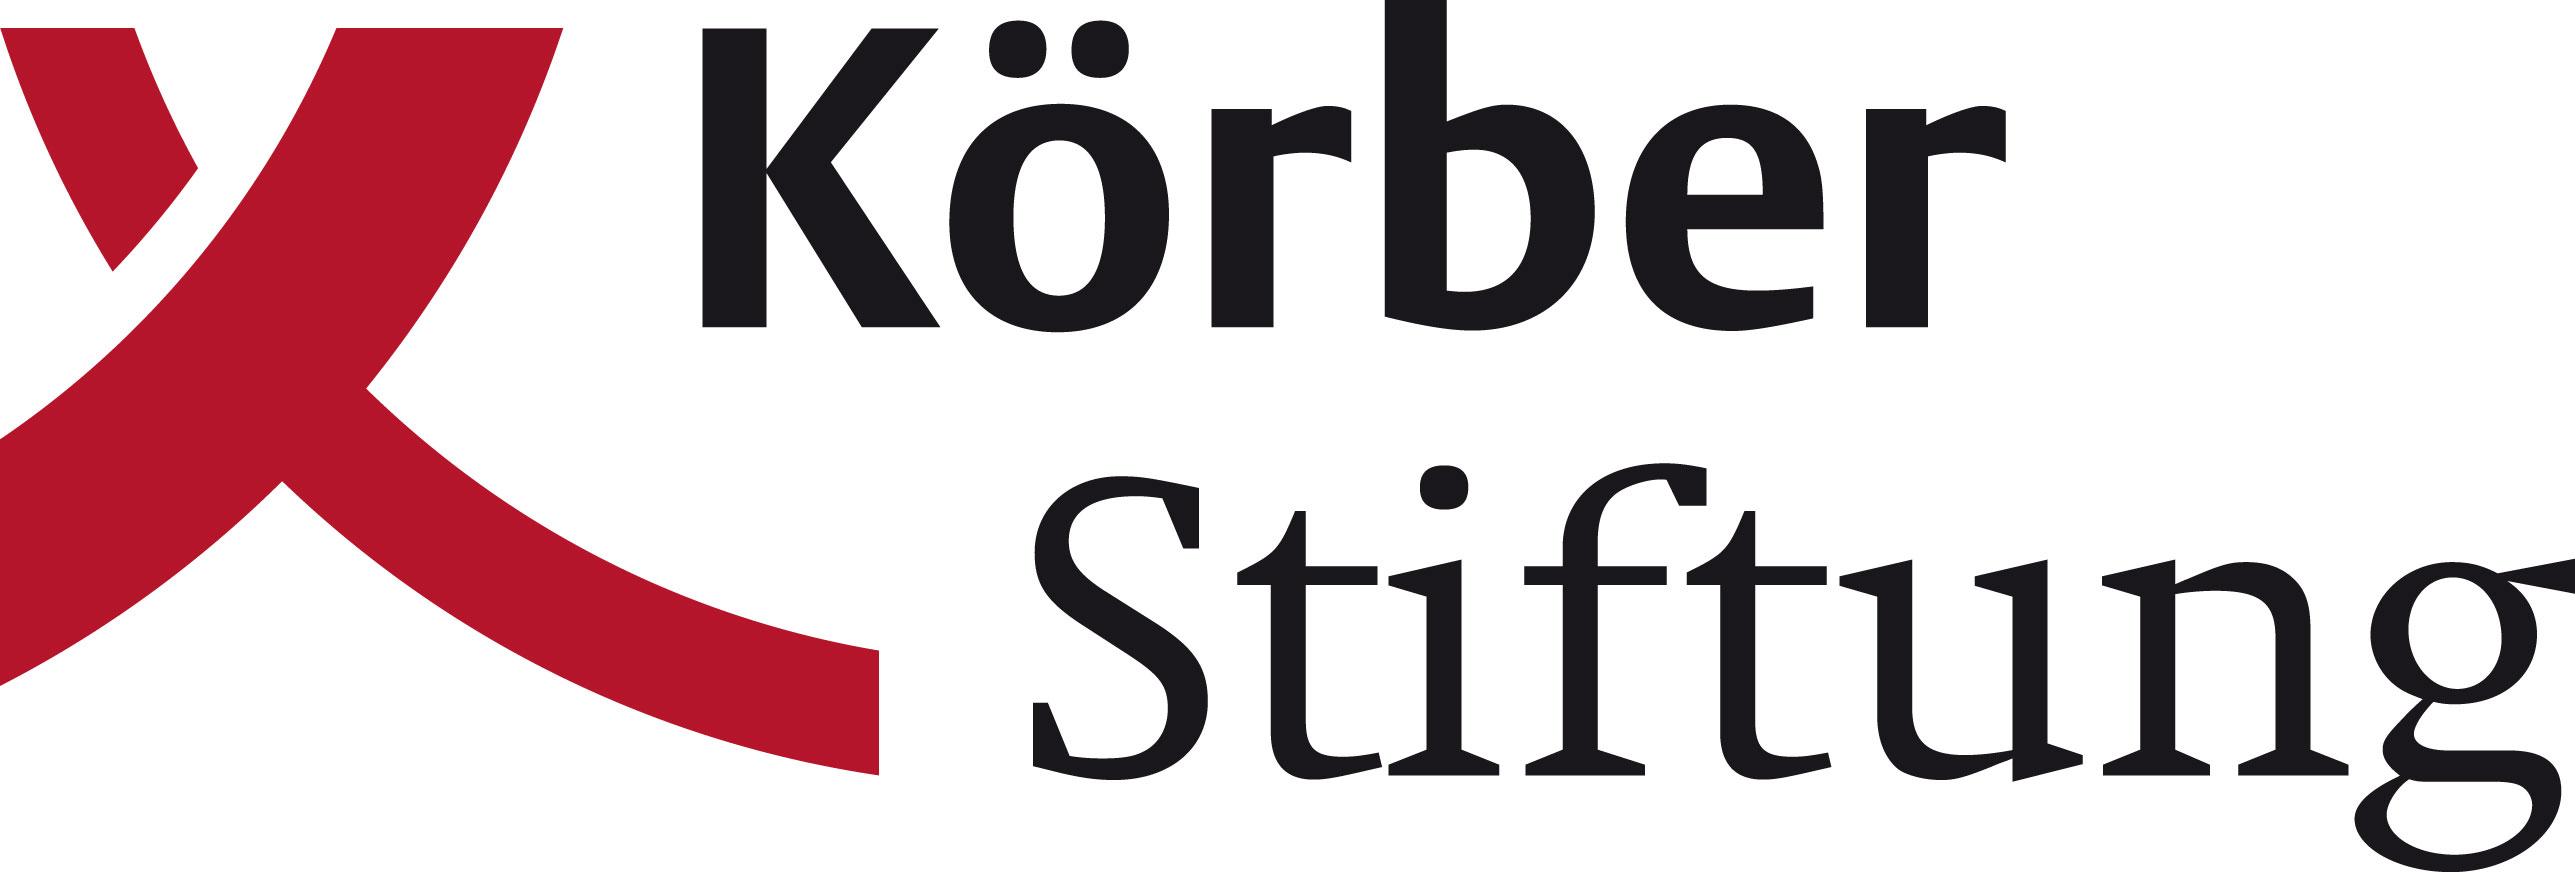 Logo der Koerber-Stiftung